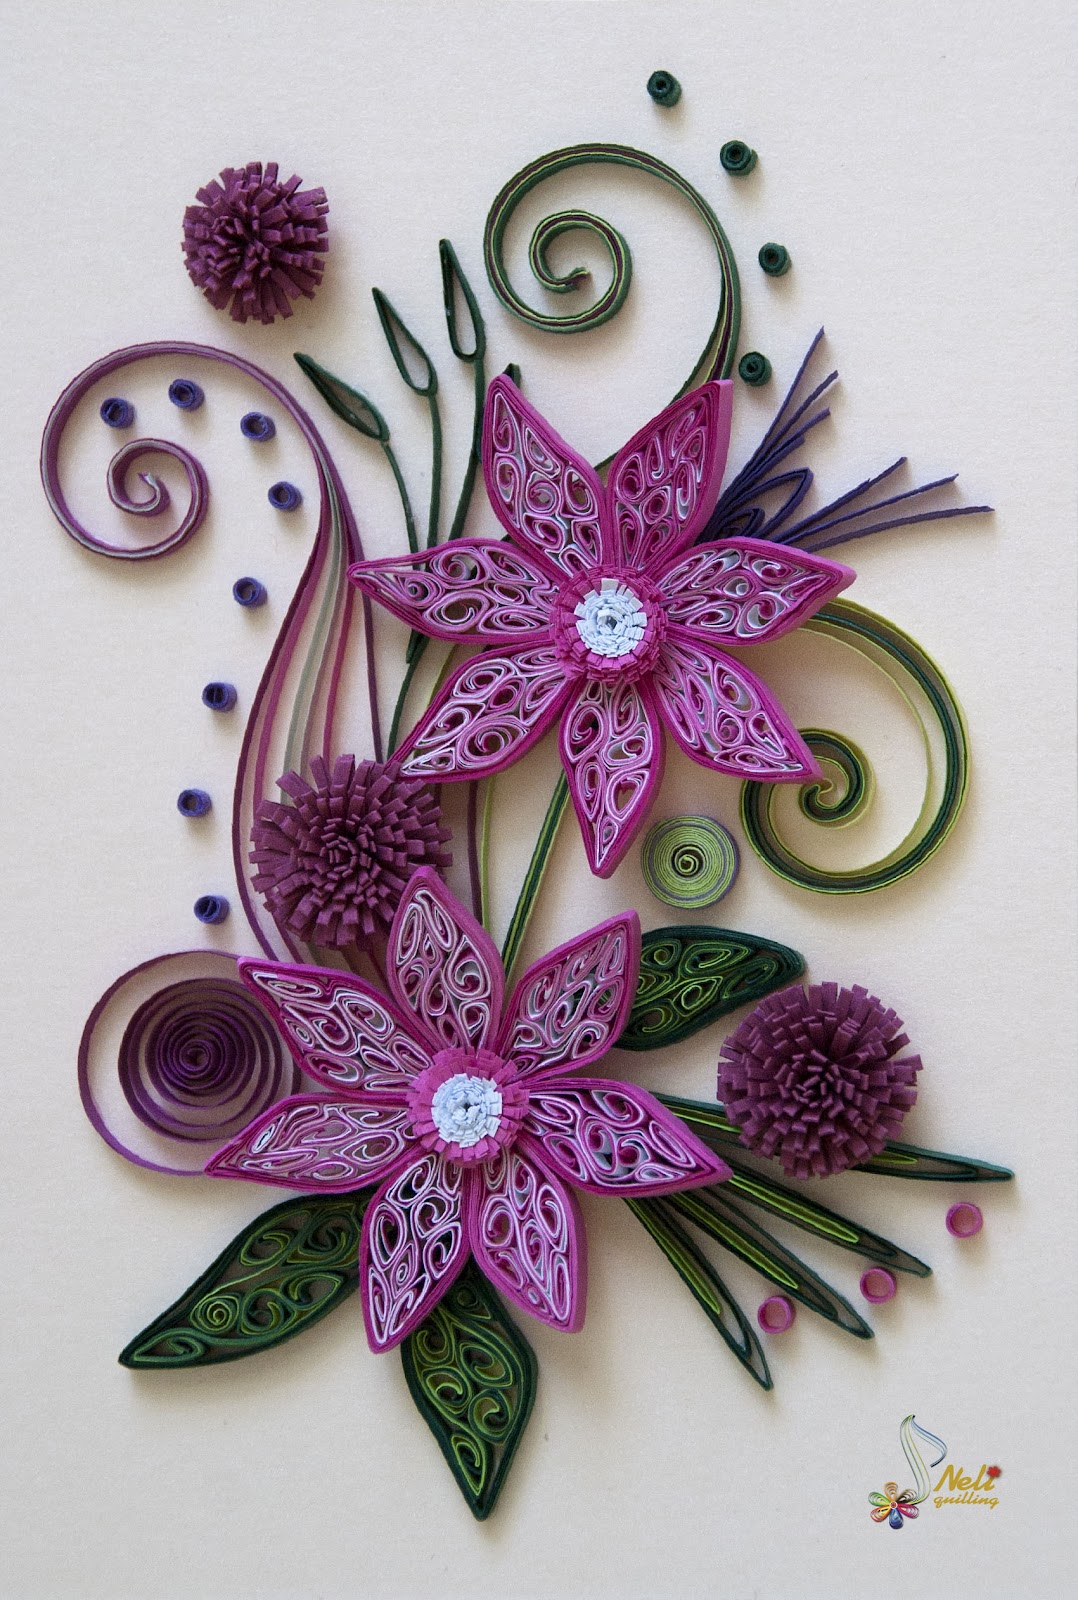 Neli quilling art quilling card purple flowers - Neli Quilling Art Quilling Card Purple Flowers